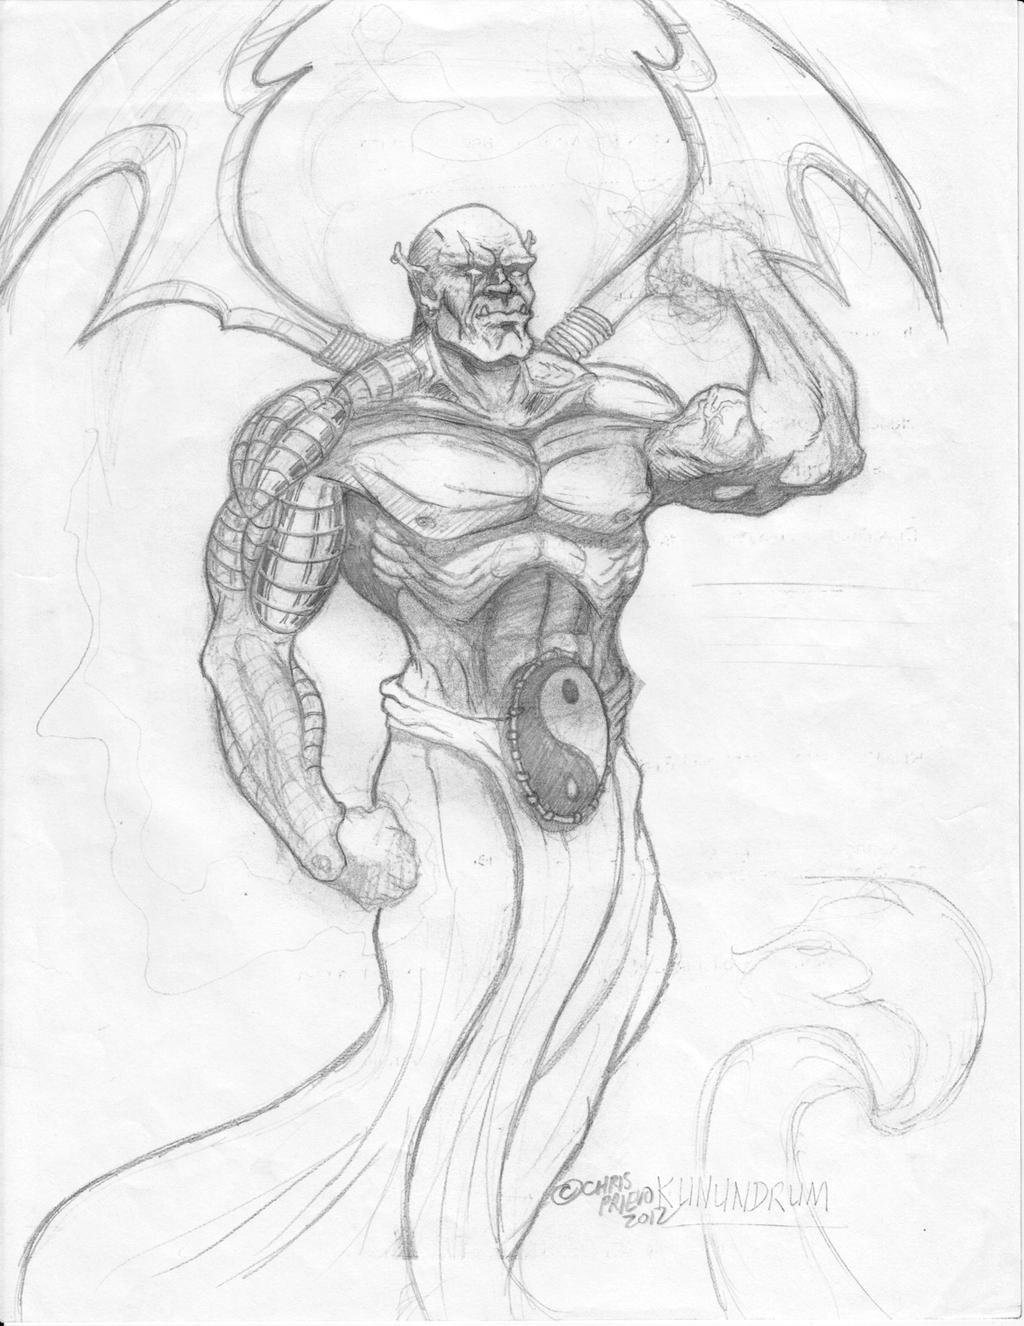 Kunundrum: The Warrior Genie re-concept by Car2nst